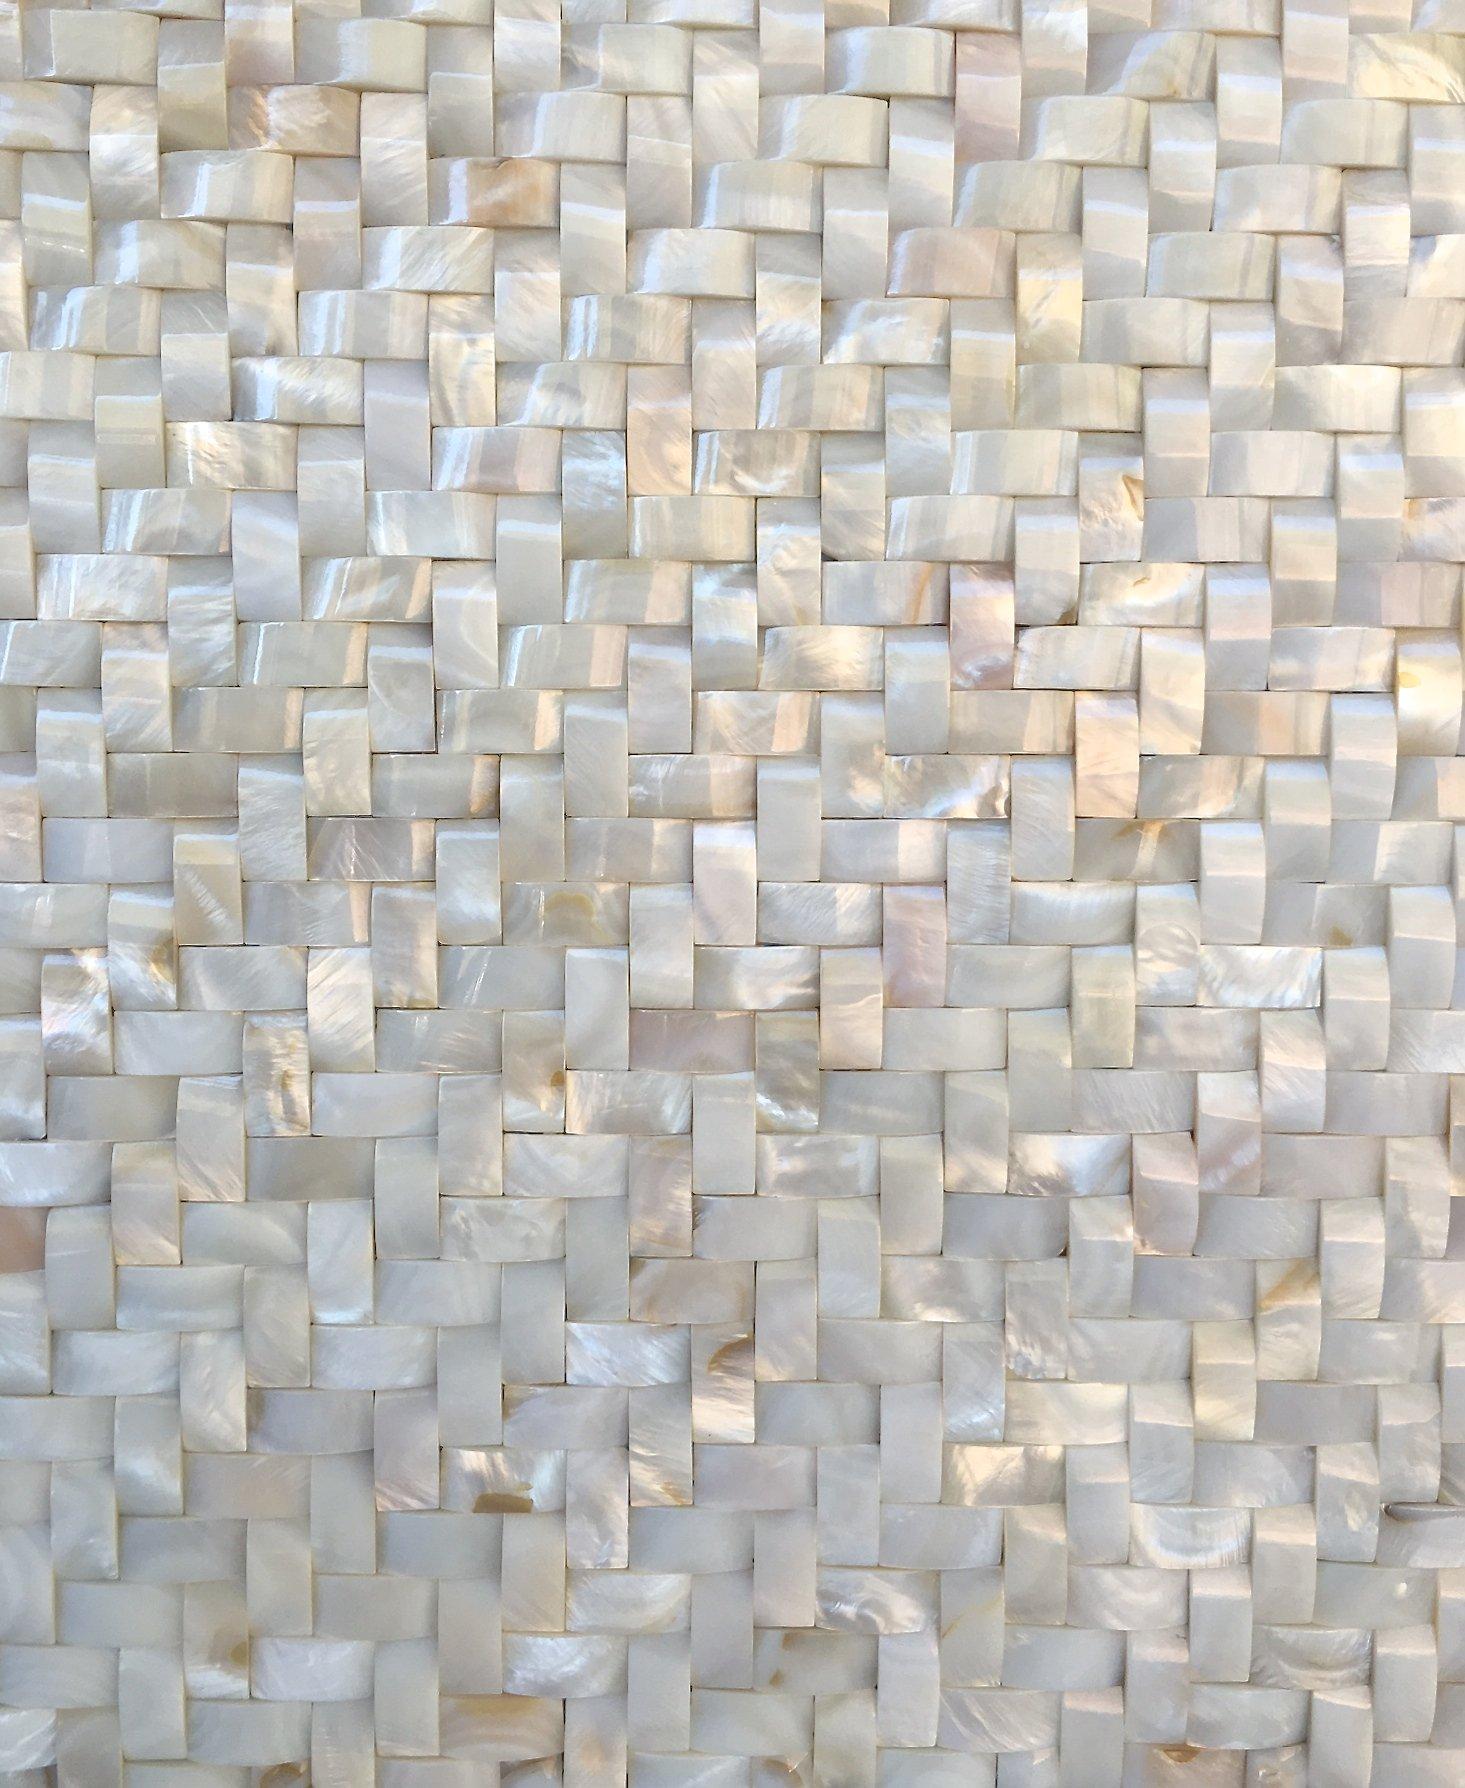 White Mother of Pearl Shell Mosaic Tile 3D Wavy Herringbone 12X12 Wall Backsplash